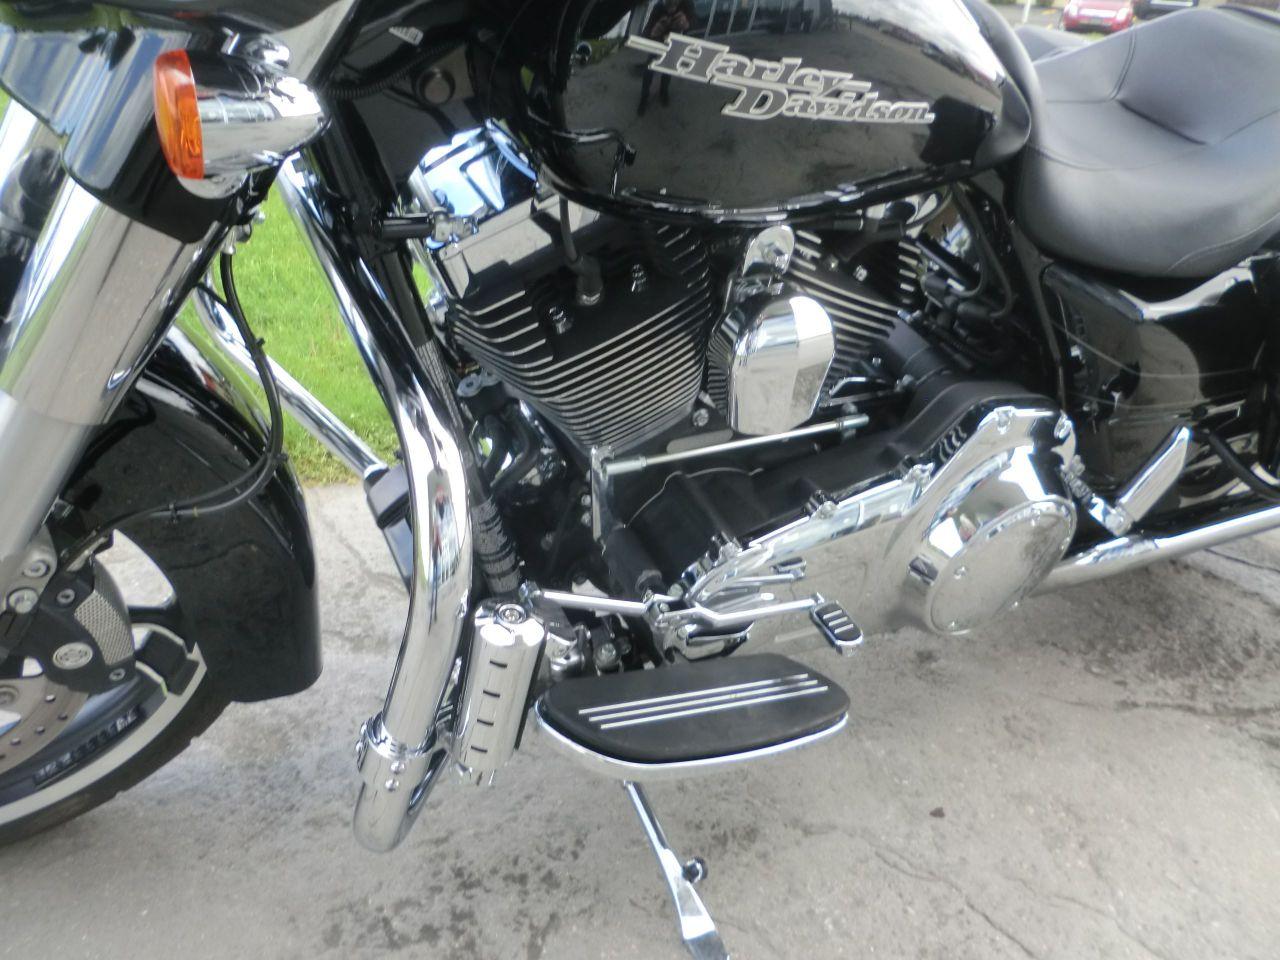 2014 Harley-Davidson FLHXS